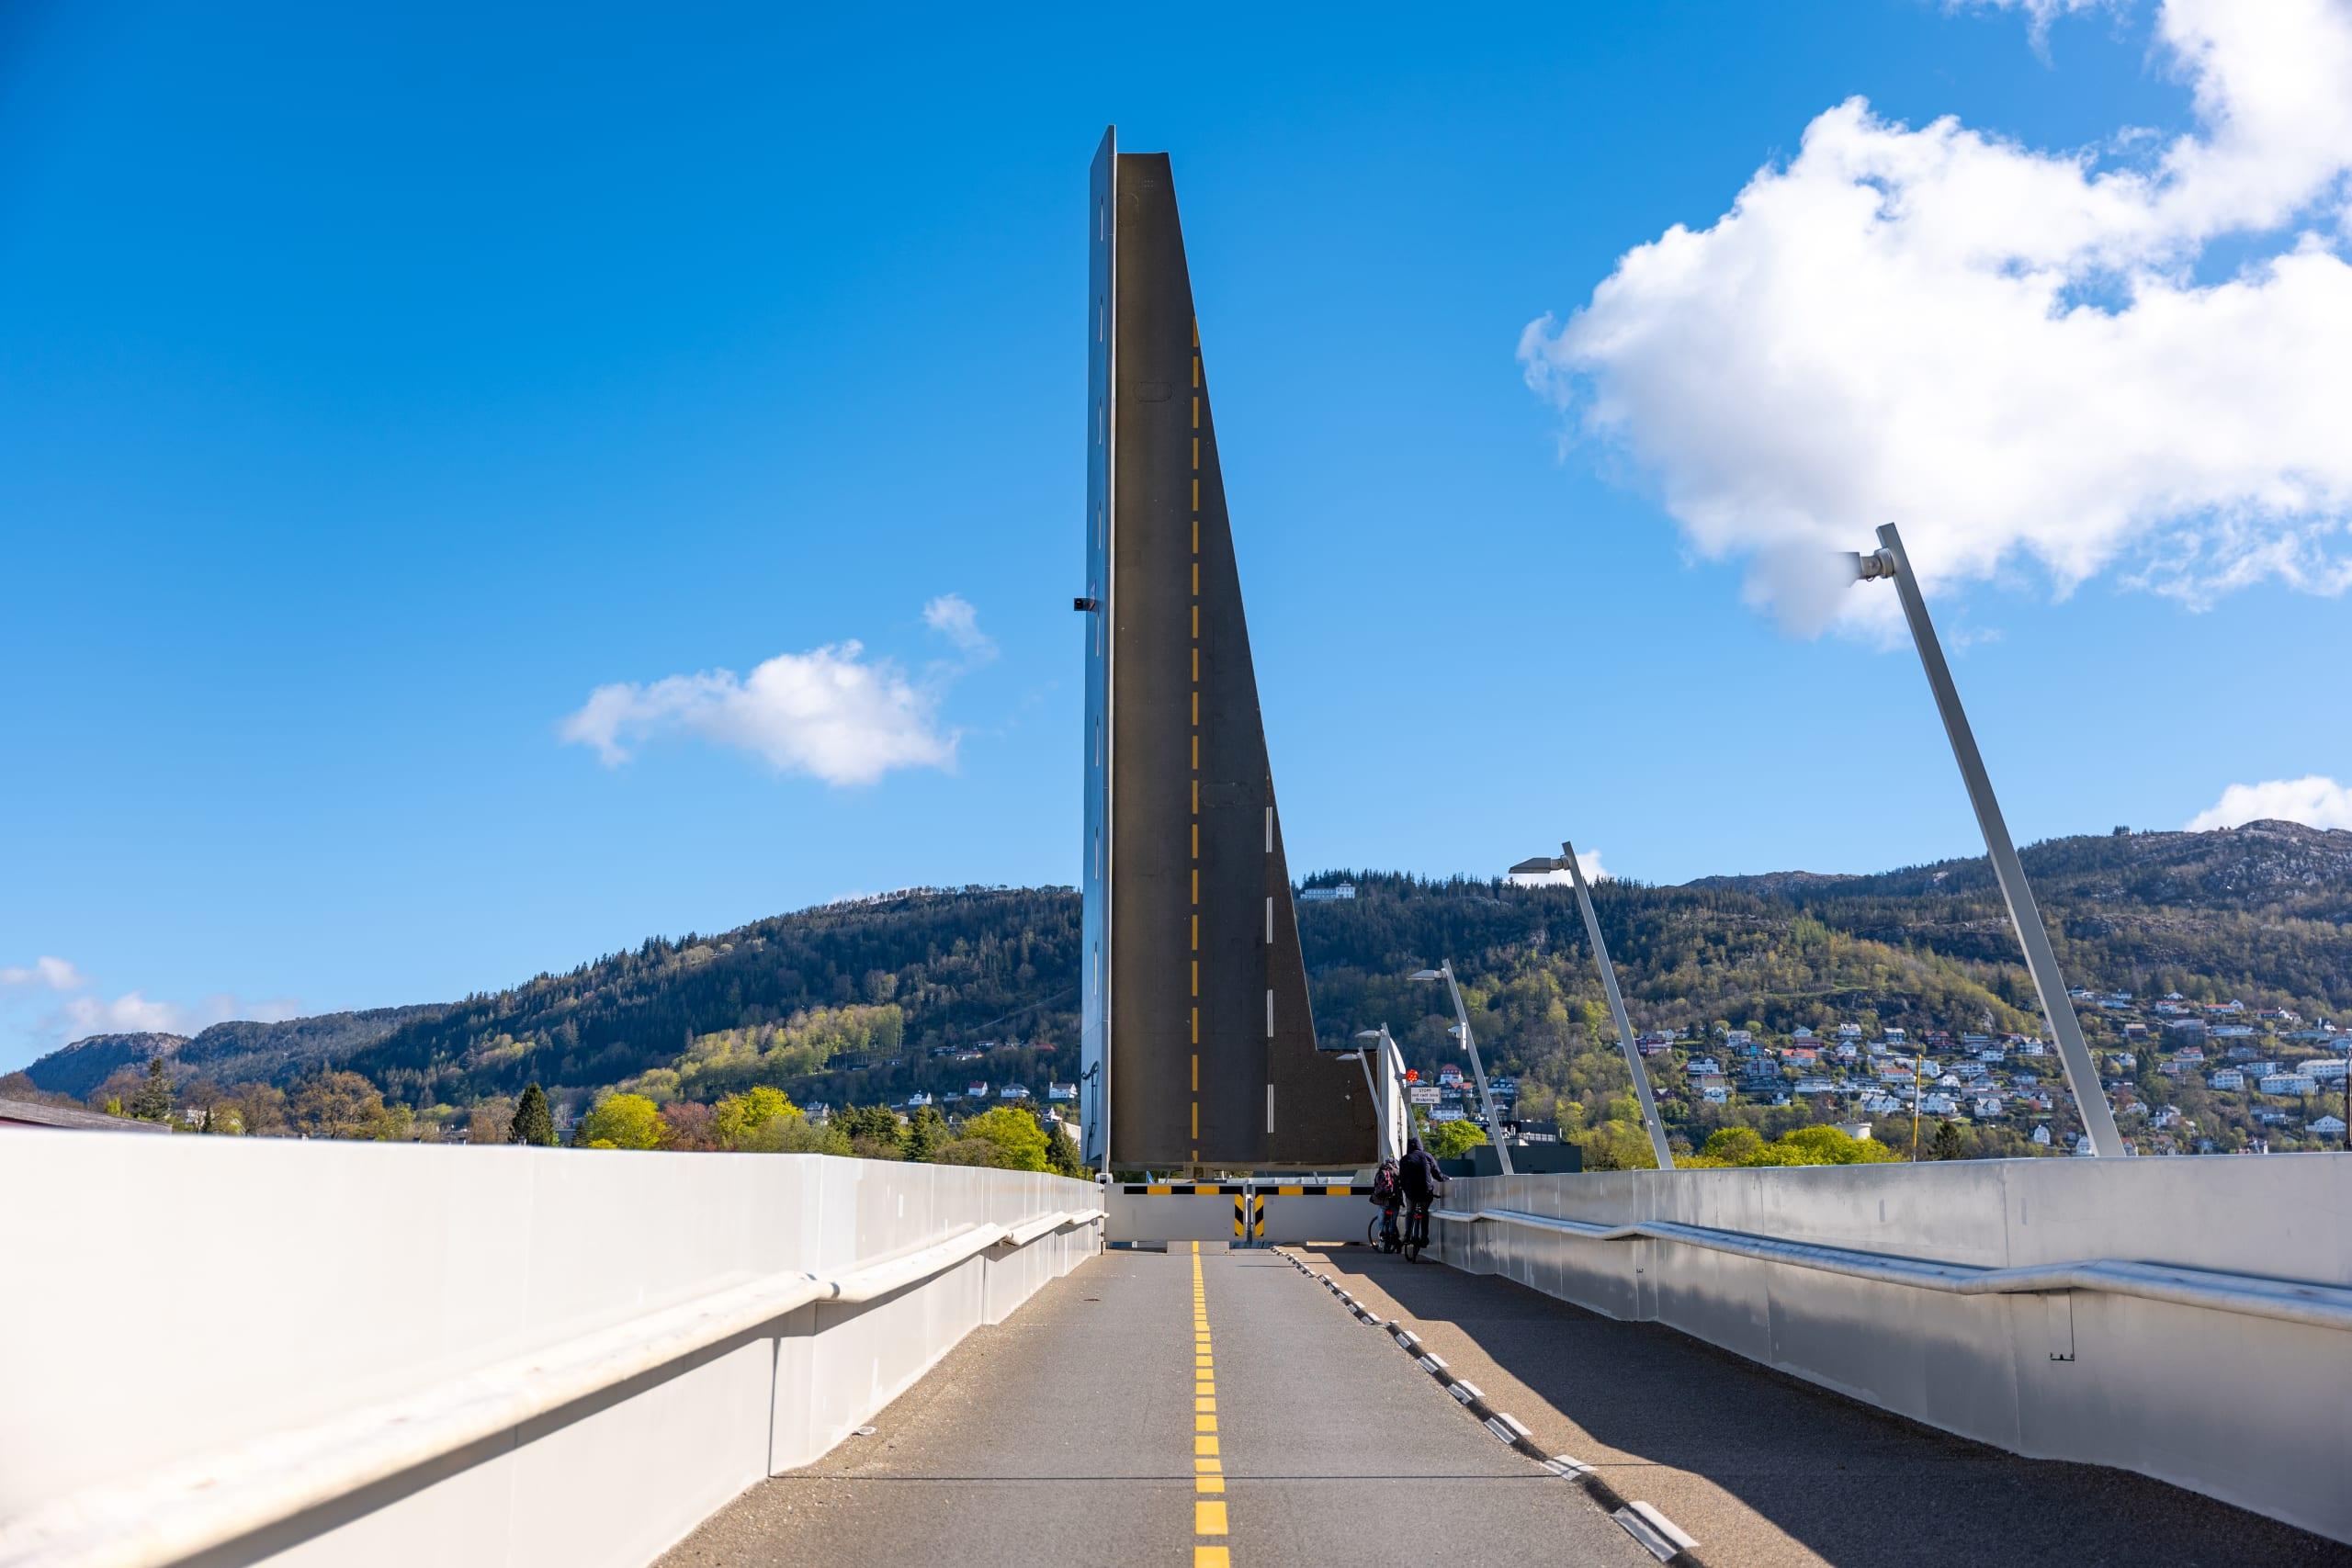 Små Pudden bridge crossing the narrow strait of Puddefjorden